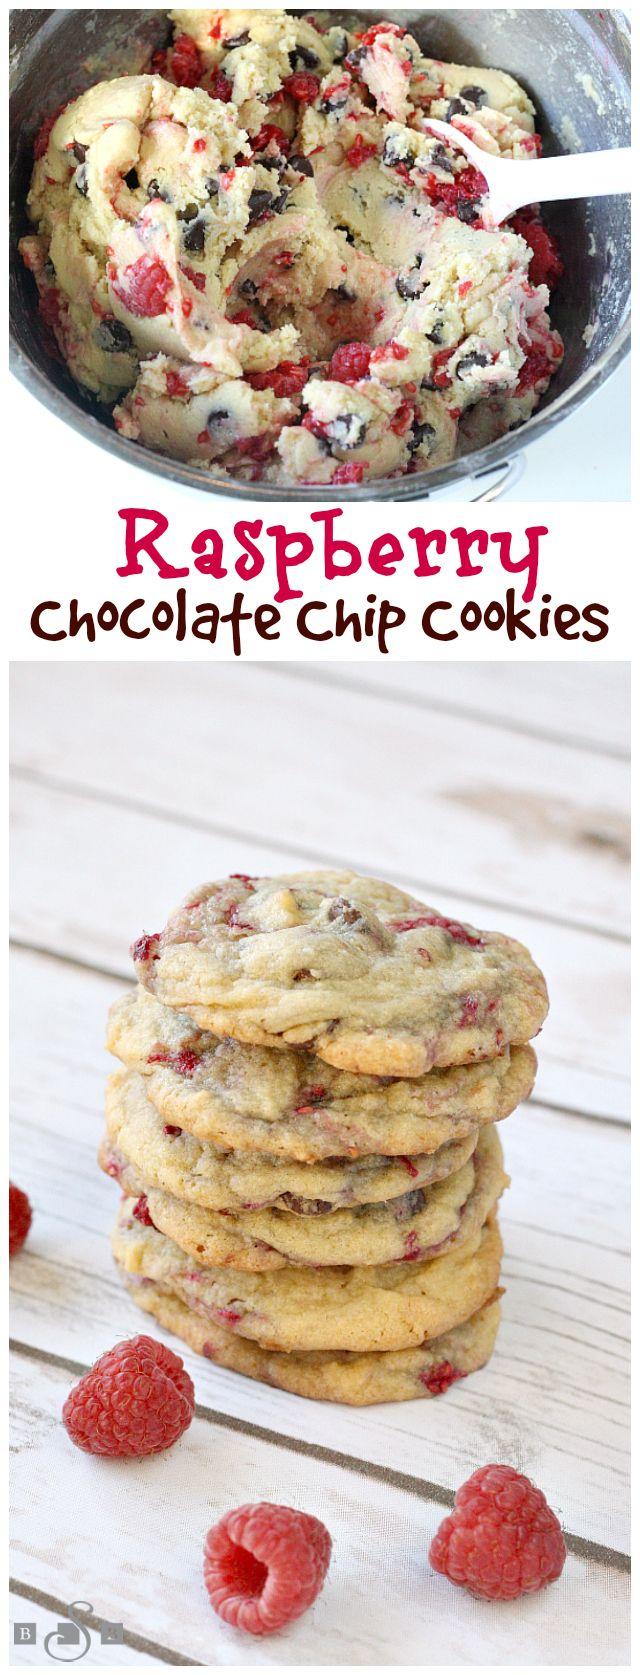 Soft Batch Mini M M Chocolate Chip Cookies Recipe Mini Chocolate Chips M M Chocolate And Bakeries